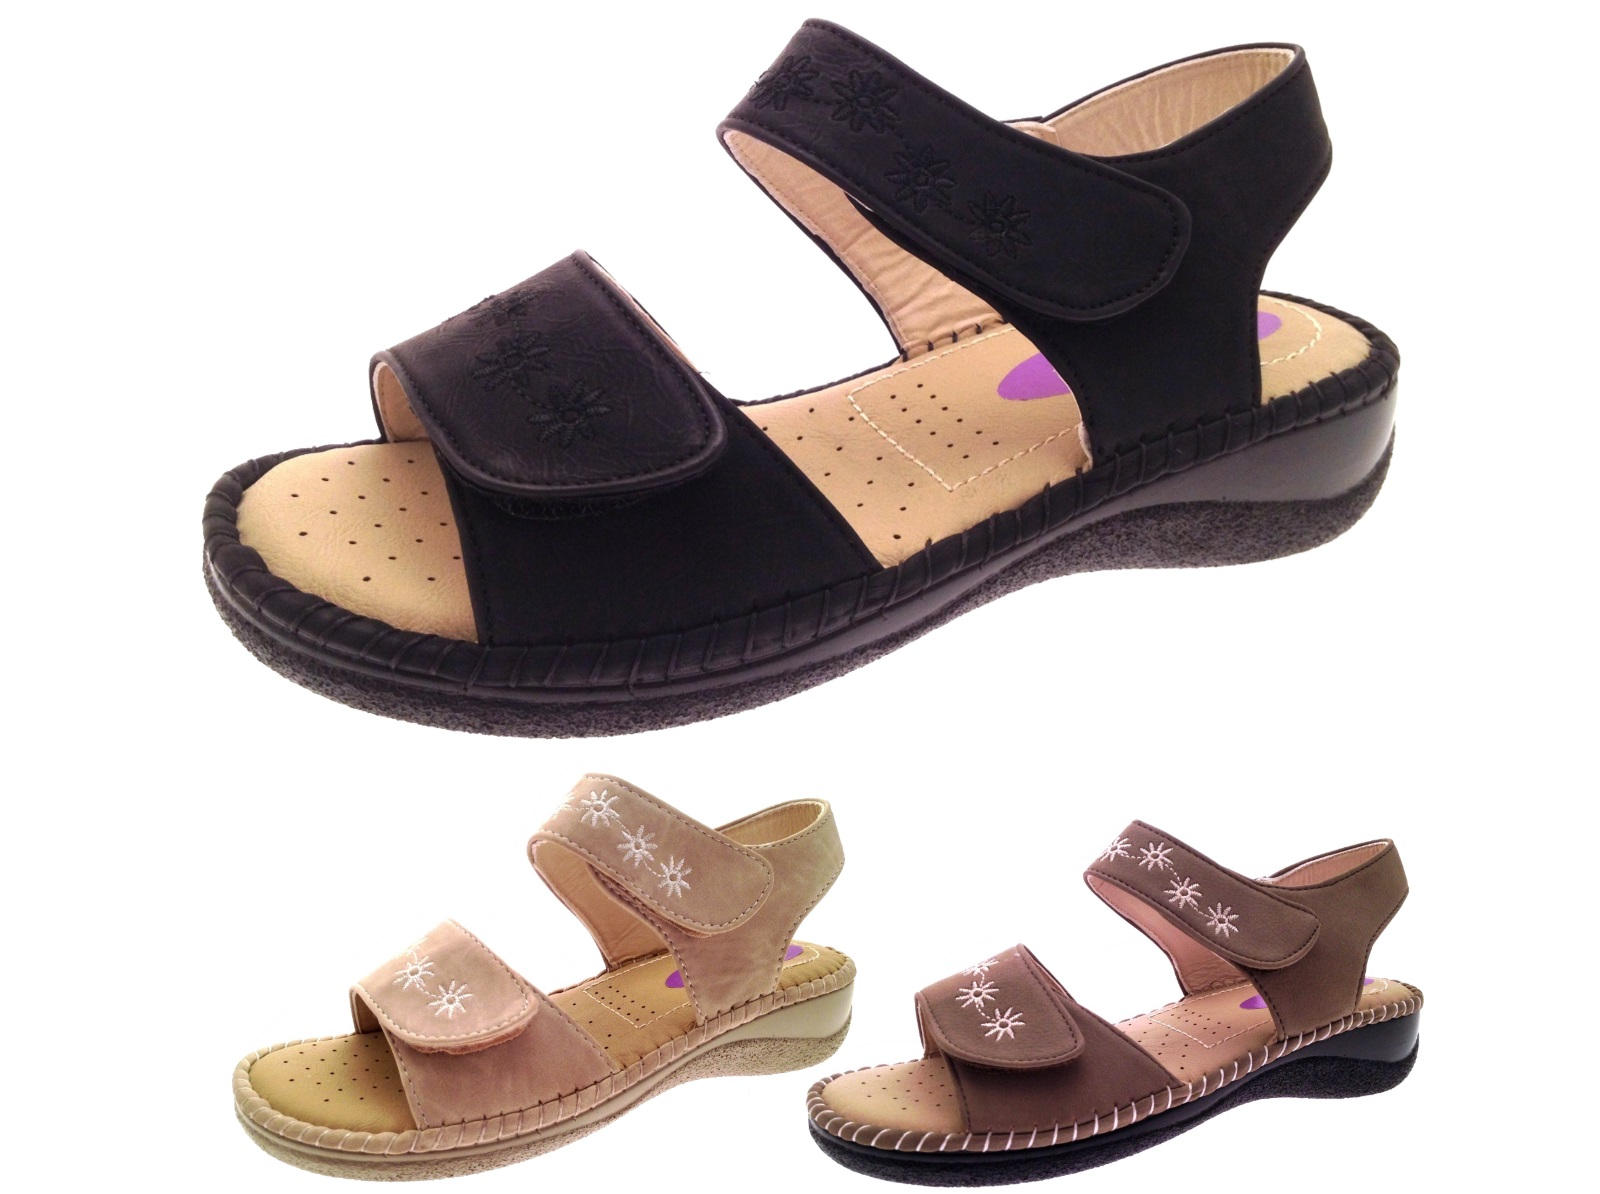 Buy women's sandals with velcro straps